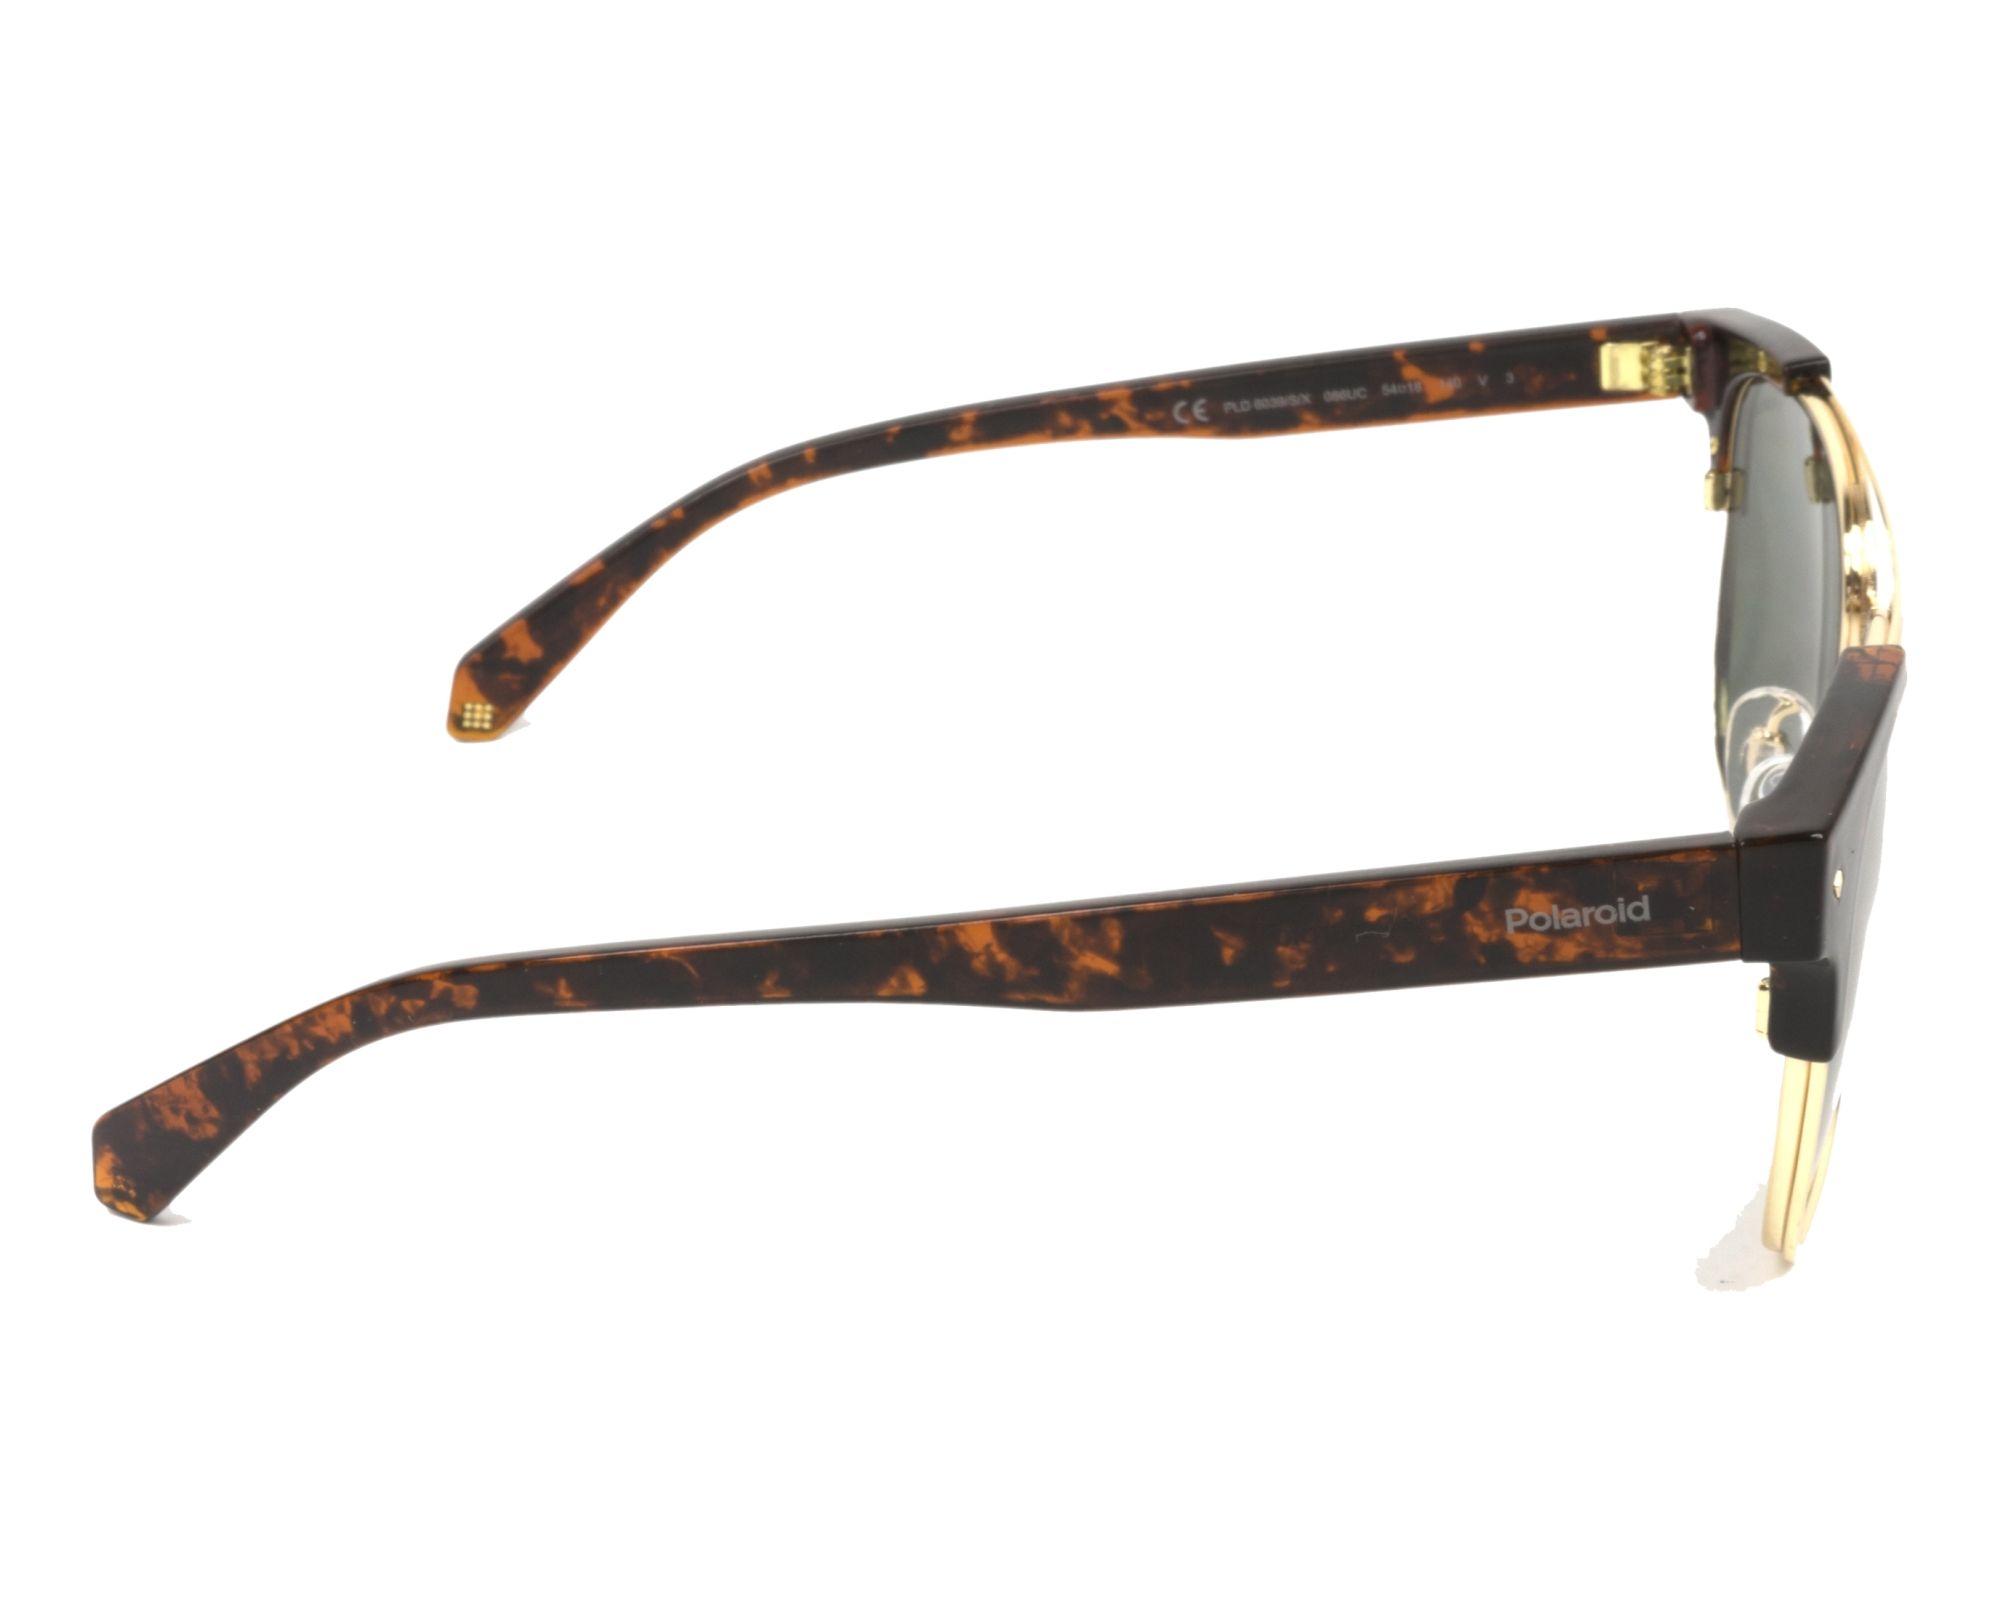 Sunglasses Polaroid PLD-6039-S-X 086 UC 54-18 Havana Gold side c51f4e0d3f